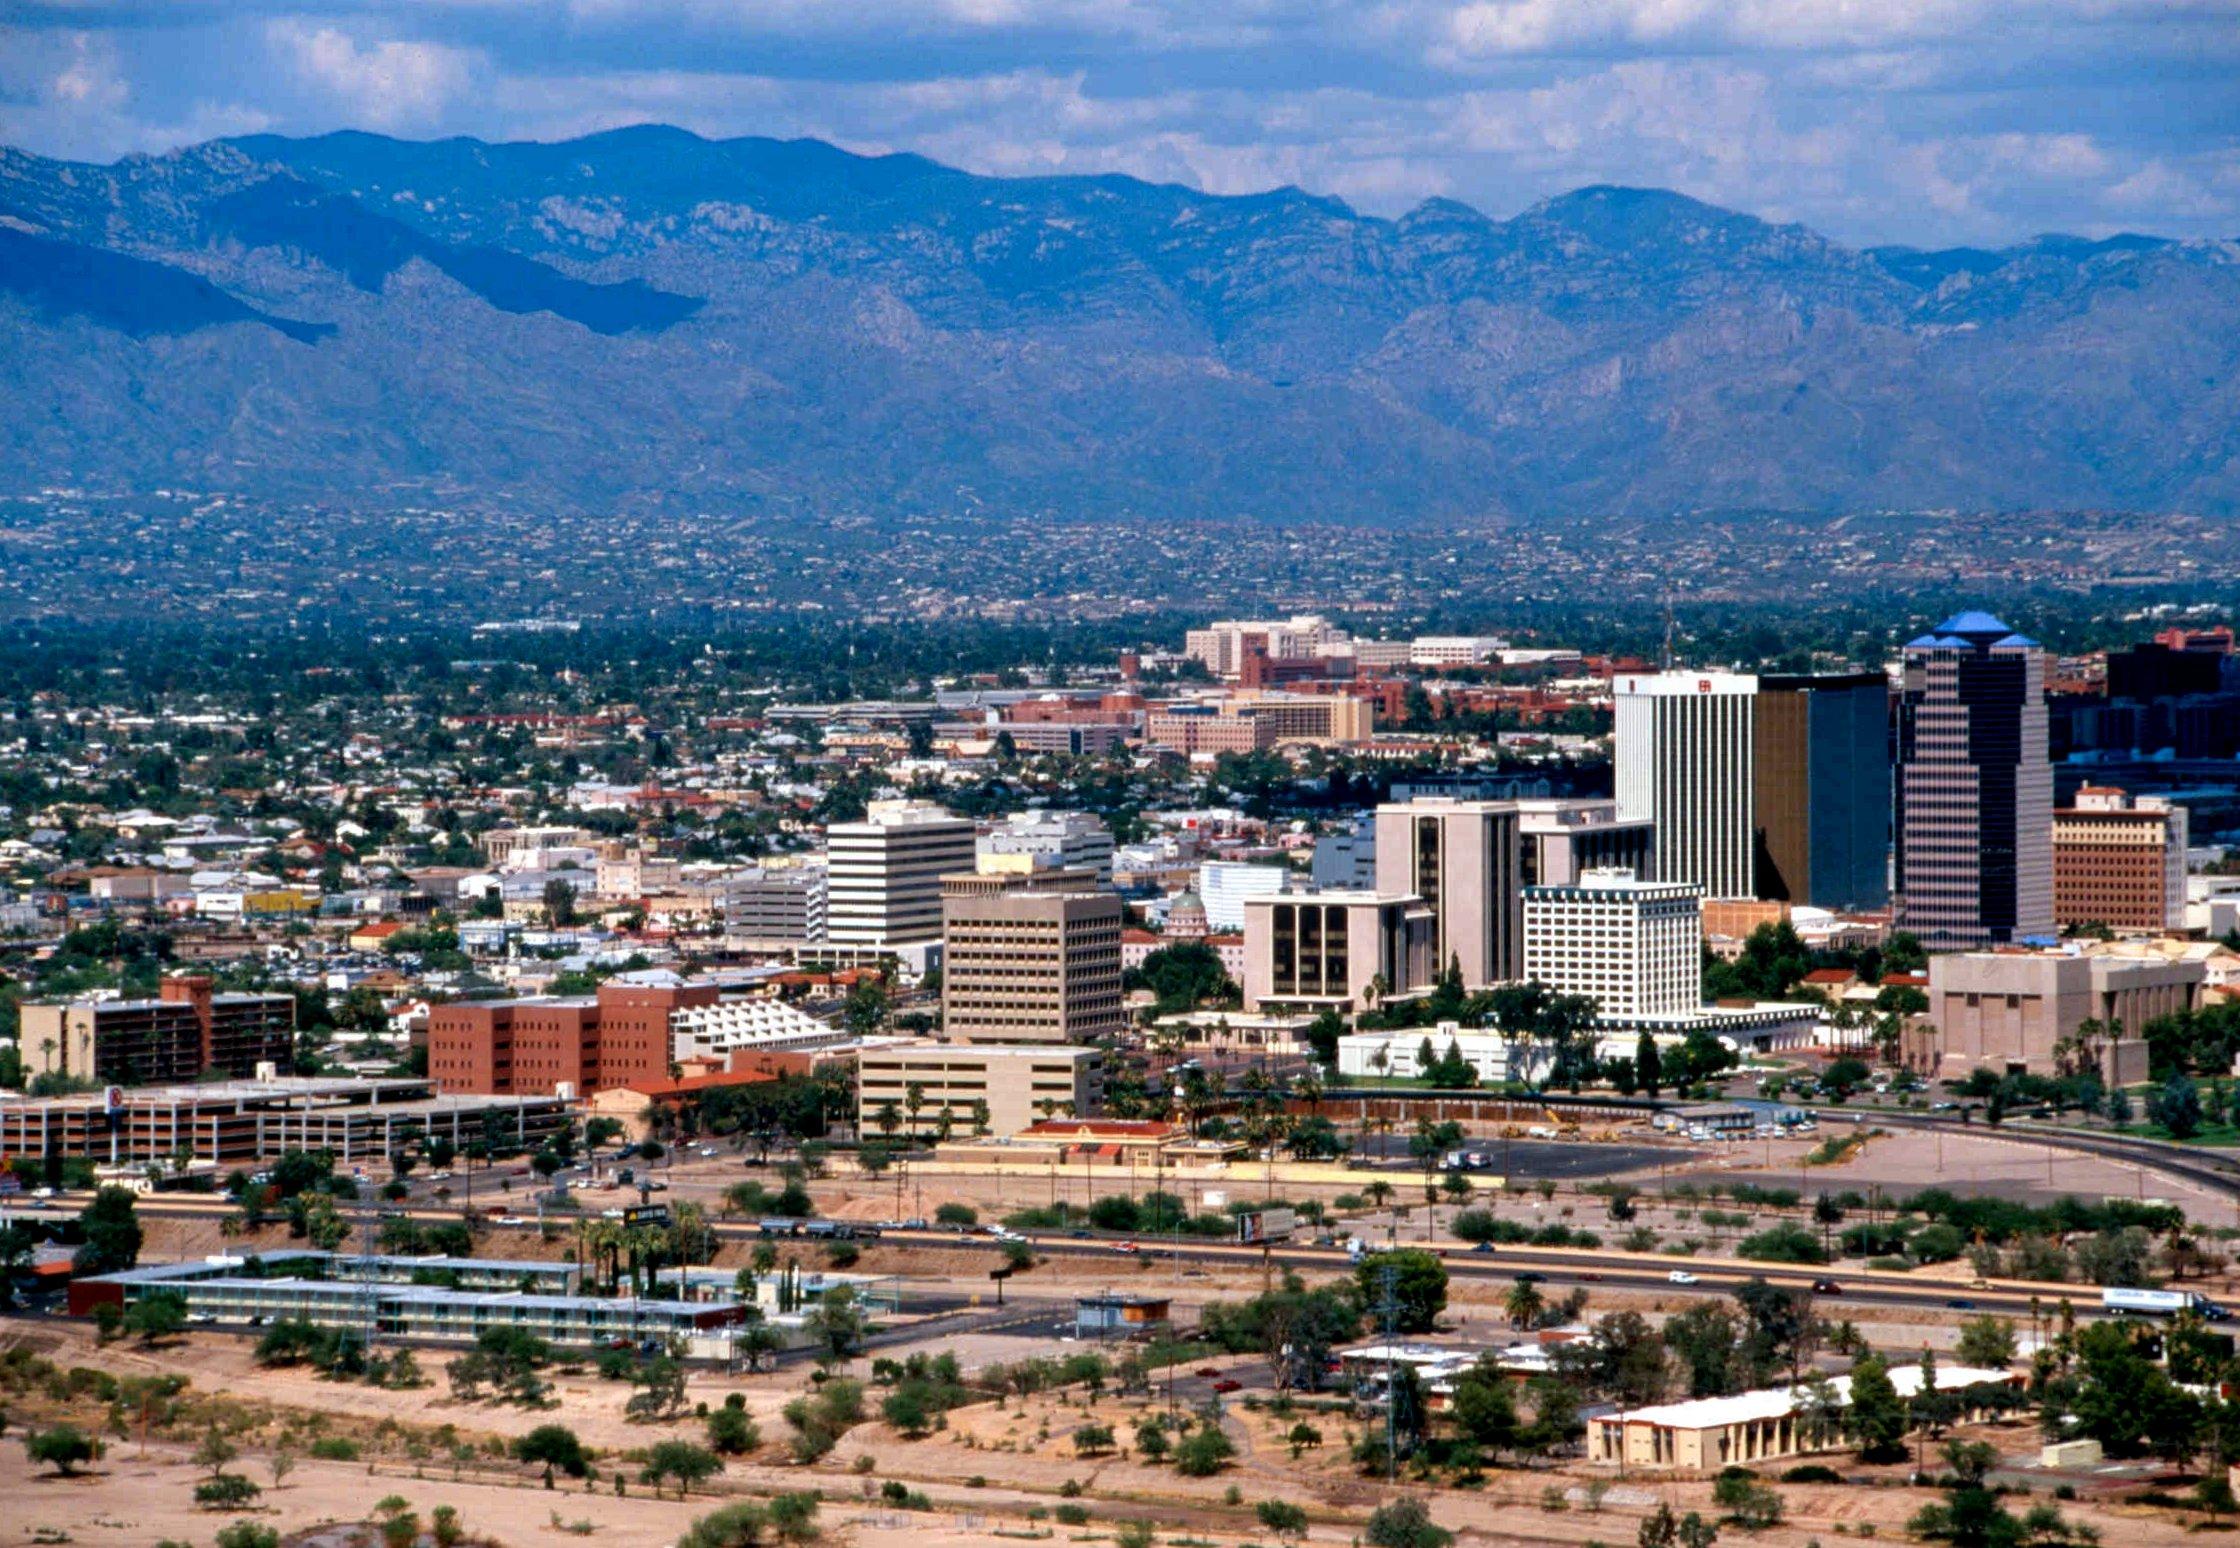 The University of Arizona, Tucson situated in the southwest US.